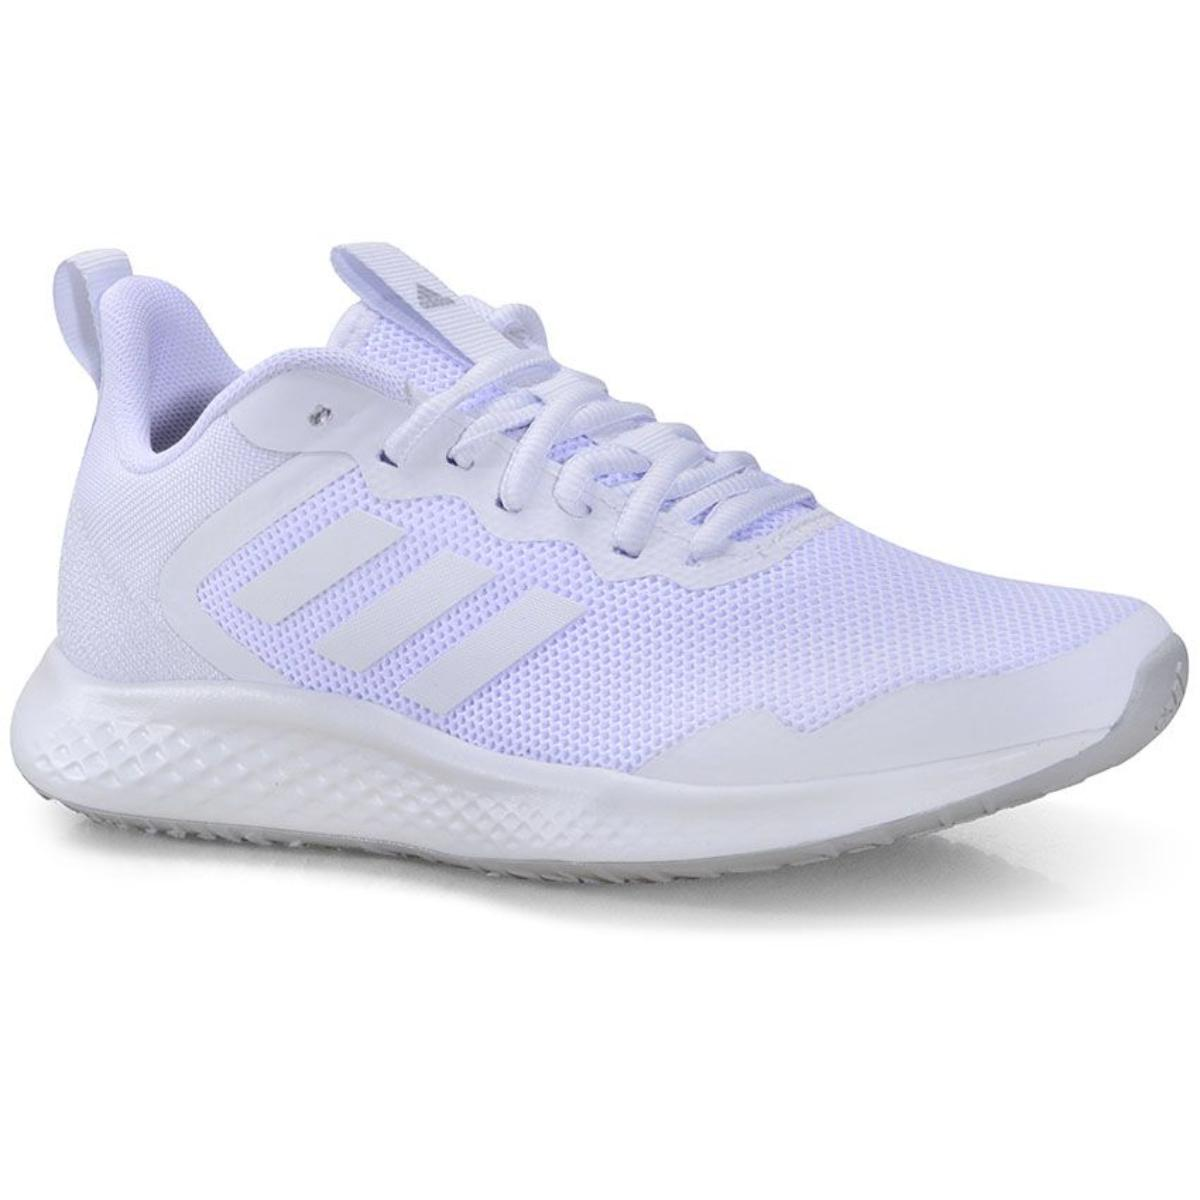 Tênis Feminino Adidas Fy8477 Fluidstreet Branco